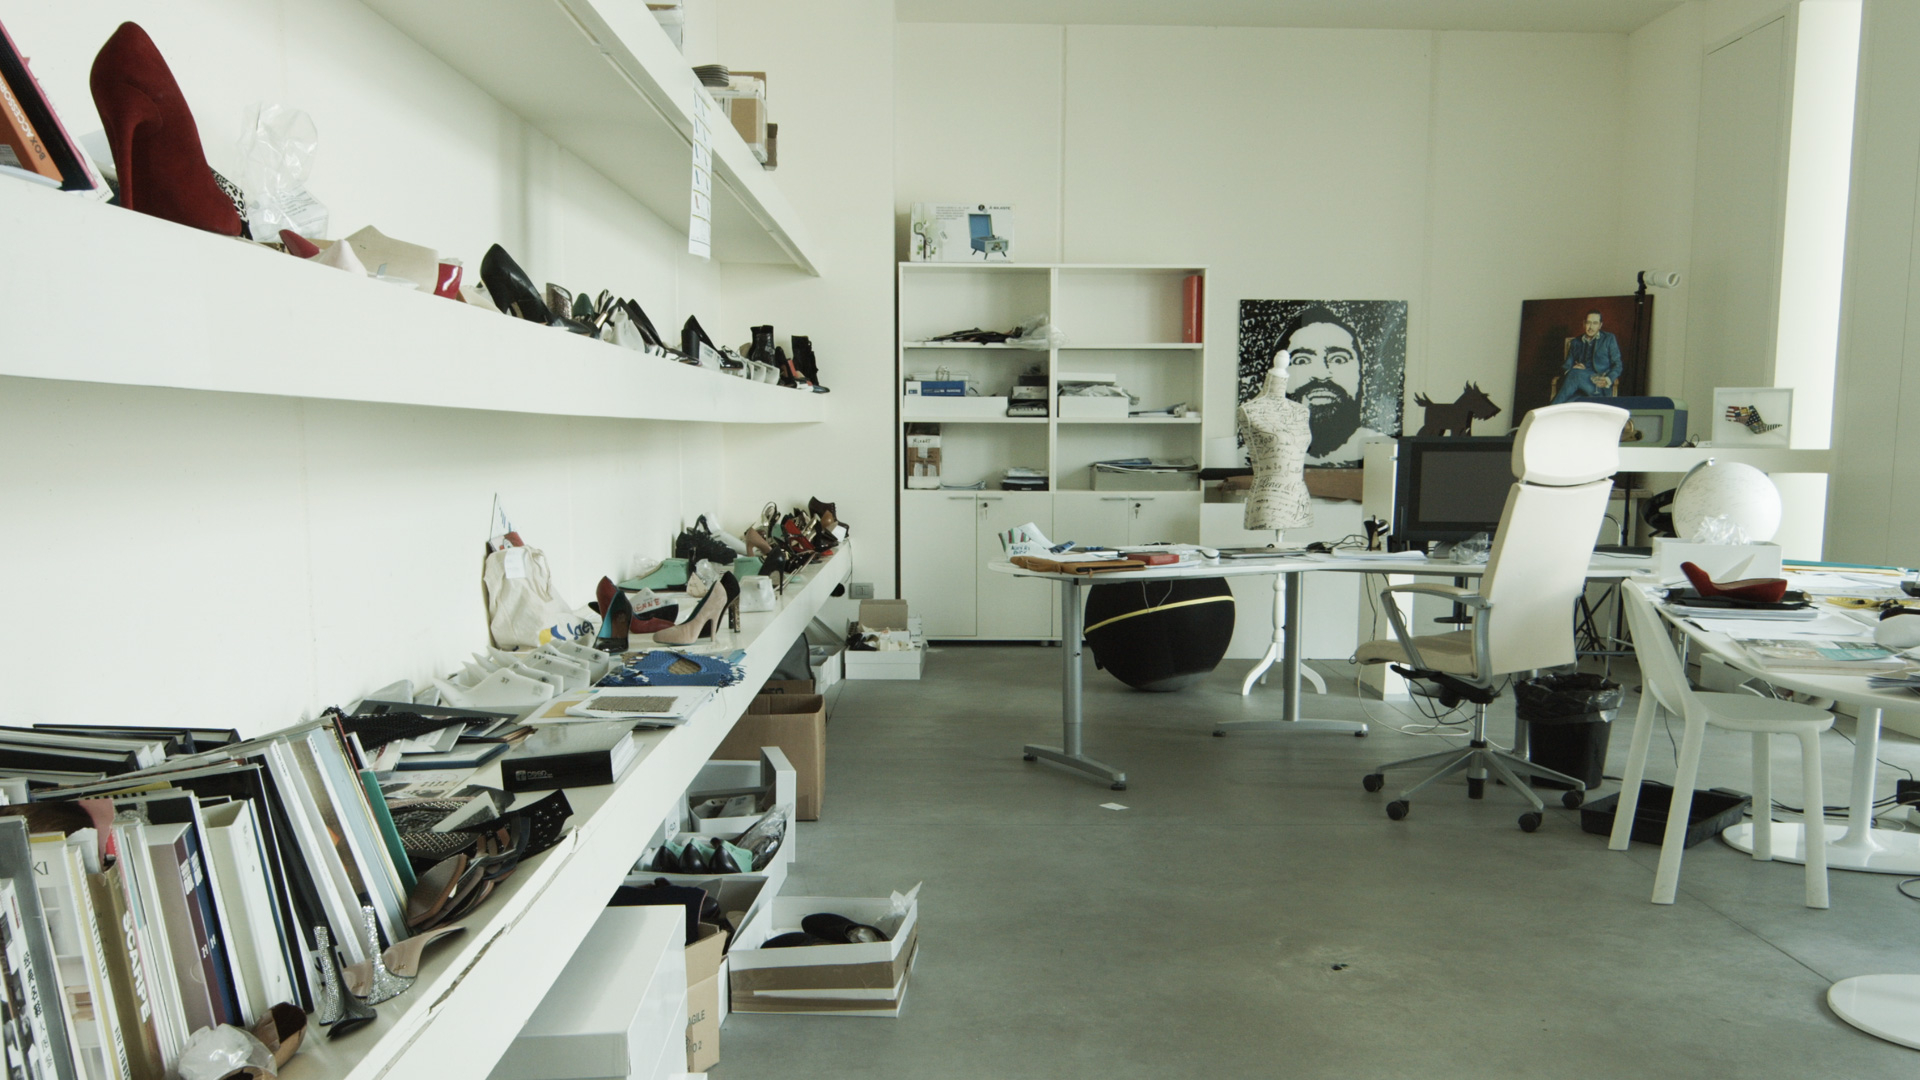 Giordano Torresi shoes